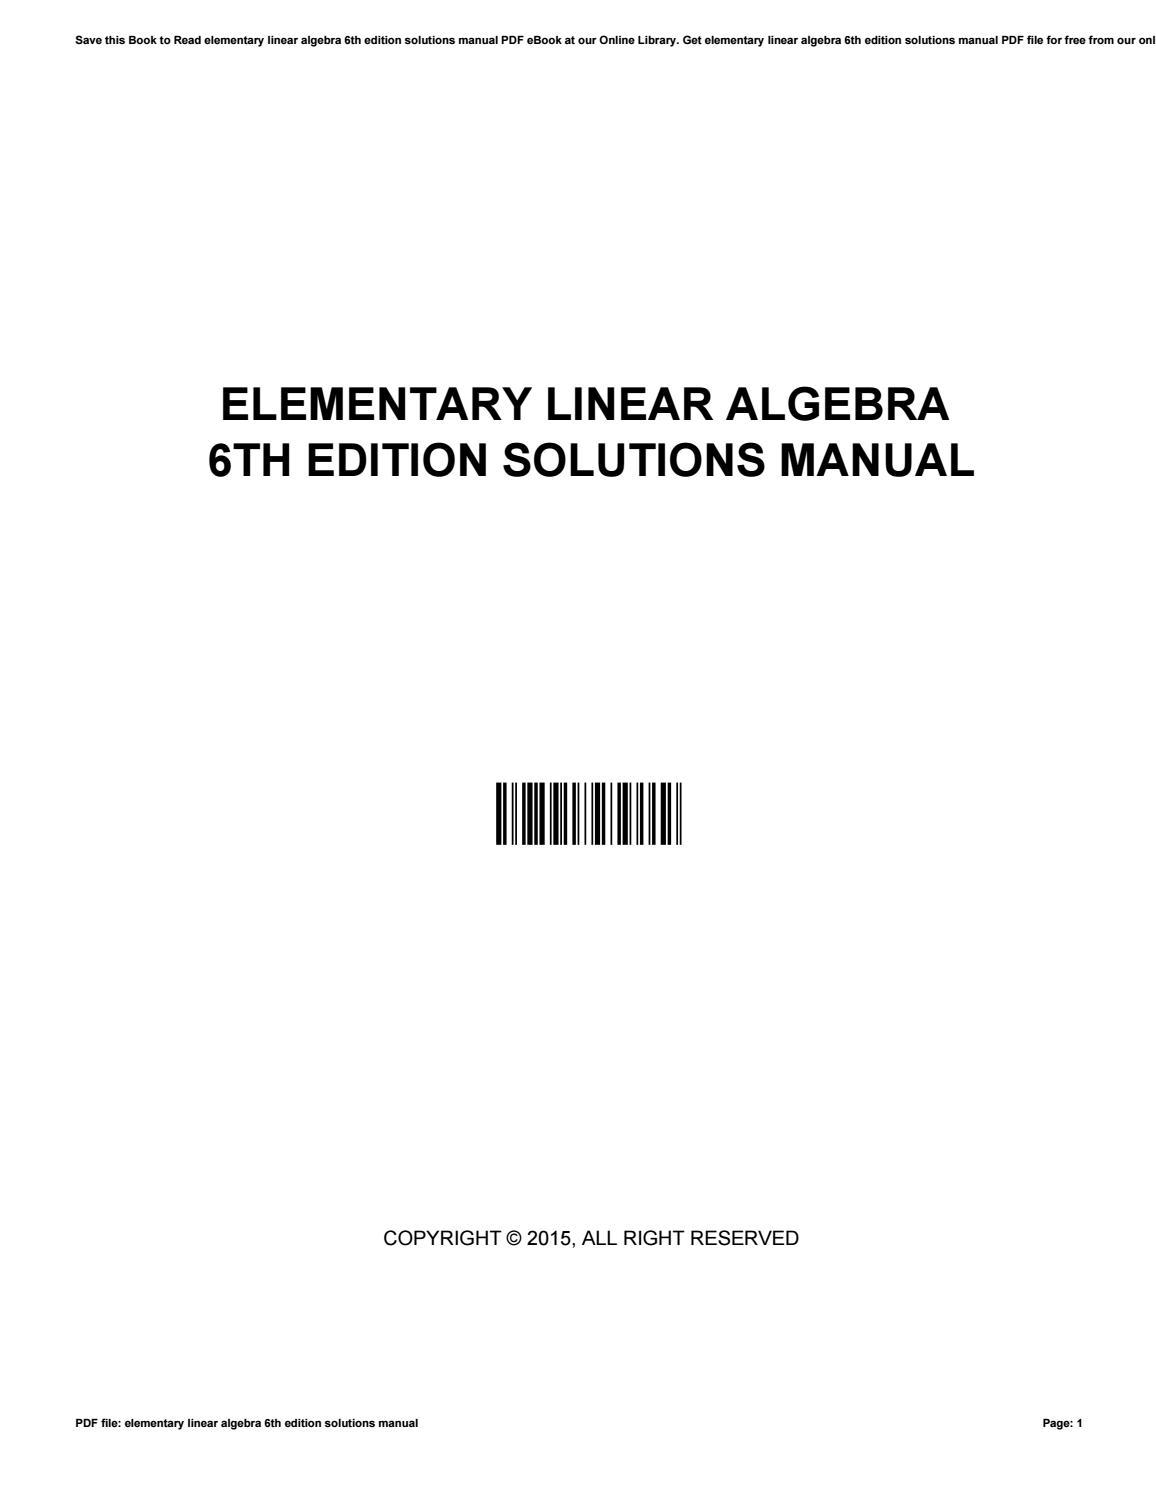 Elementary linear algebra 6th edition solutions manual by  EthelVelasquez4384 - issuu